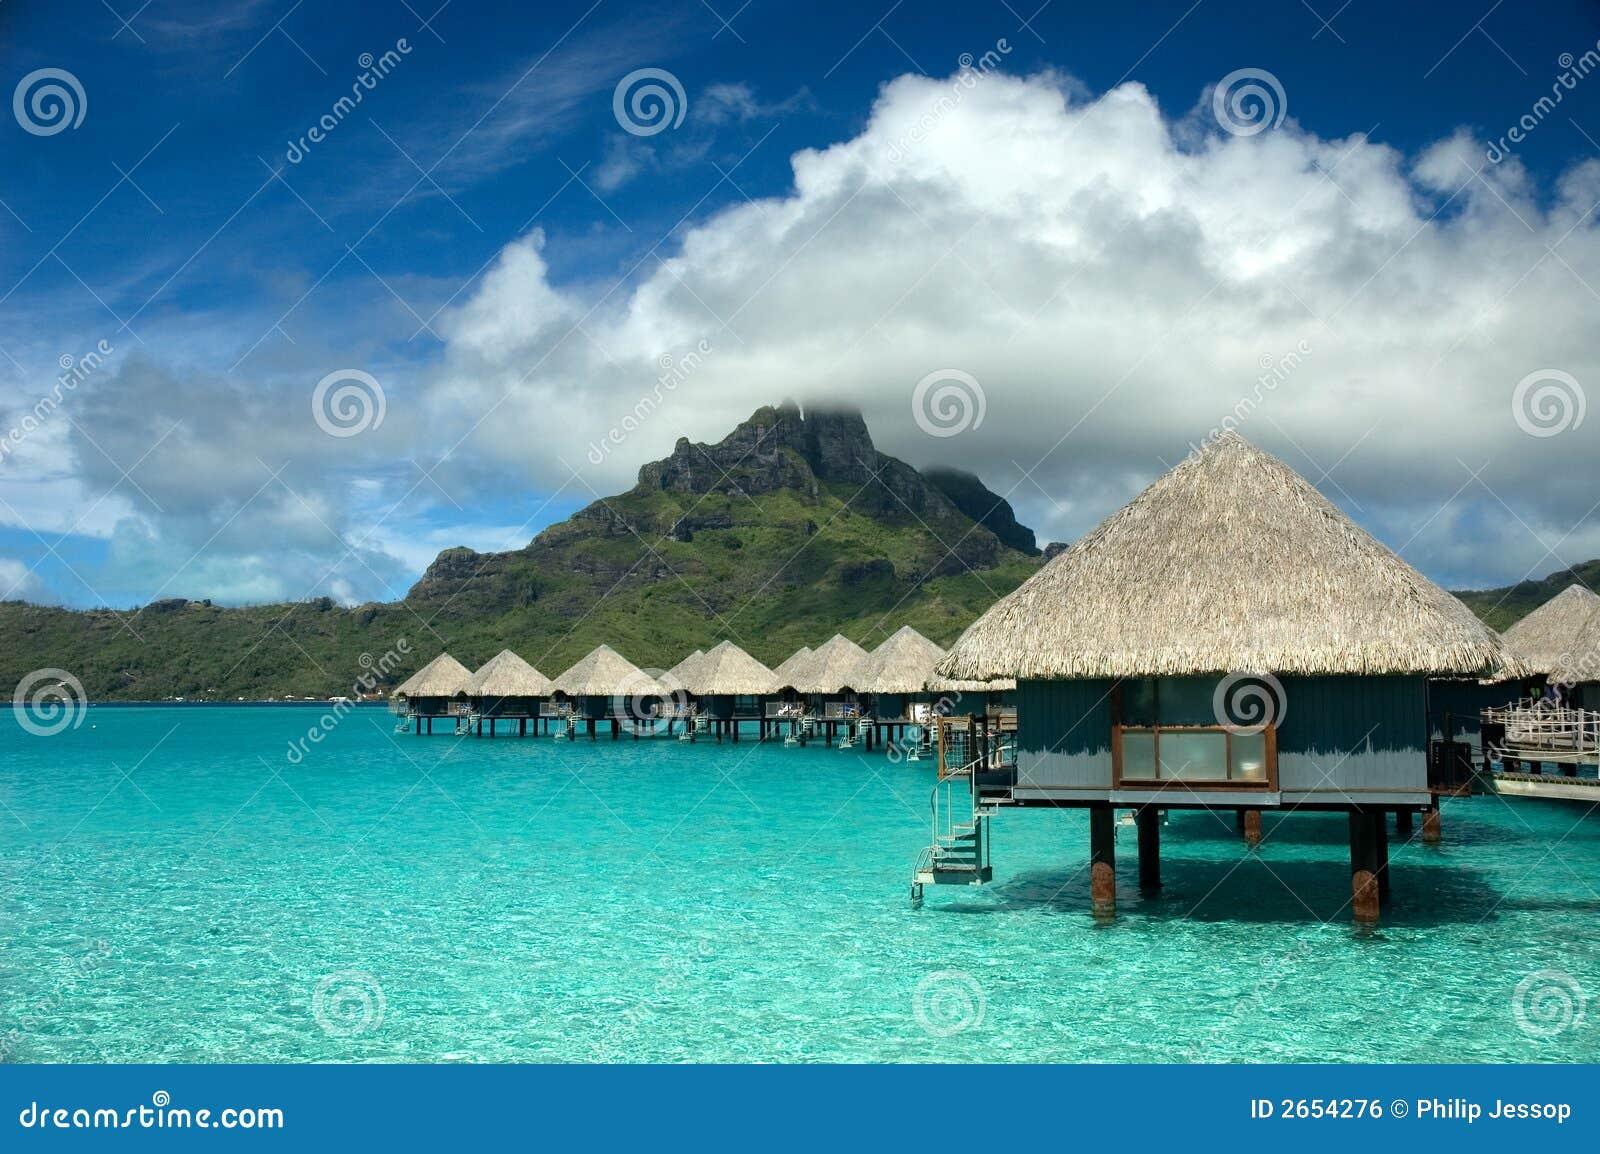 Overwater Bungalows (Pangkor Laut Island)